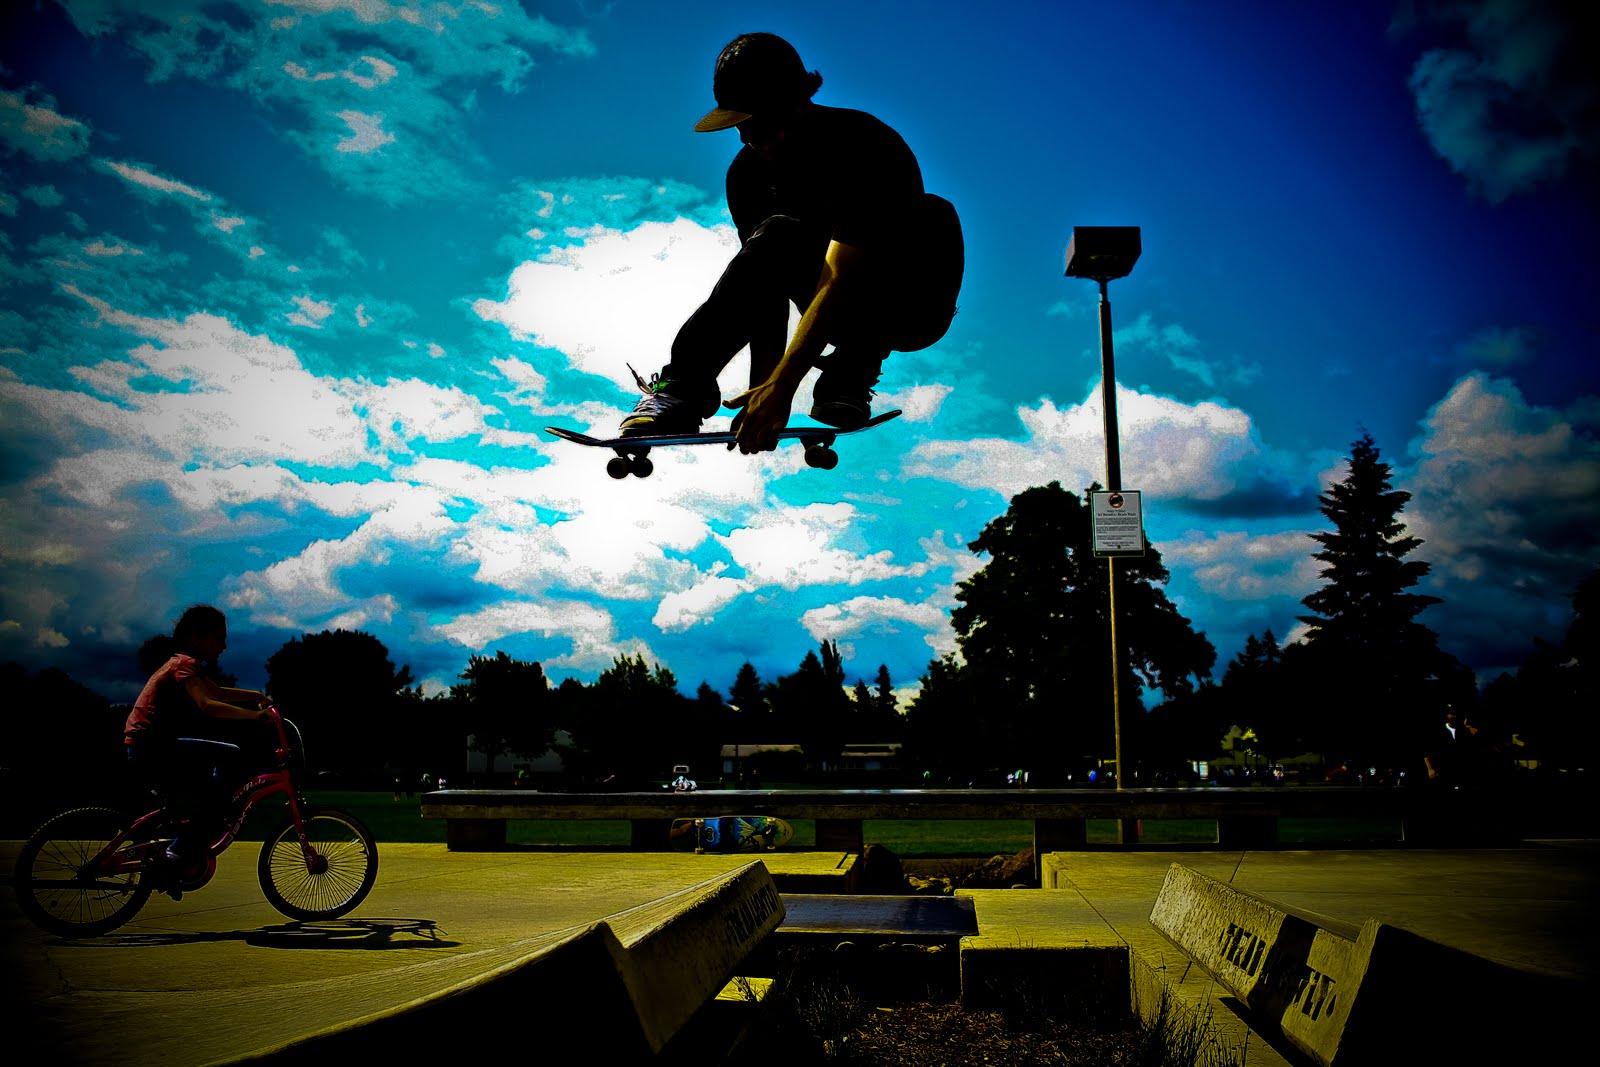 carrie bernard skateboarding wallpaper